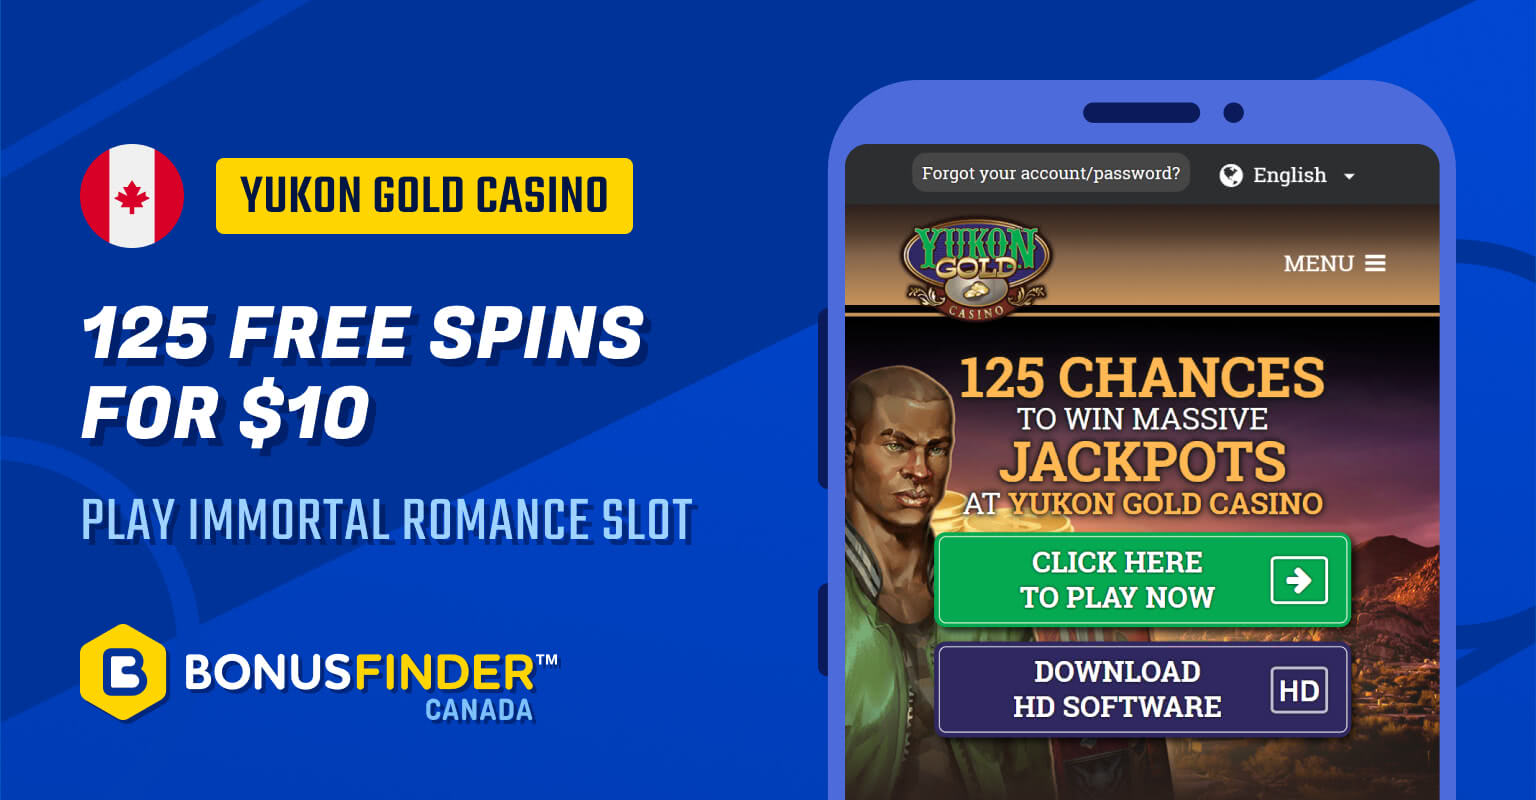 Yukon Gold Casino Mobile